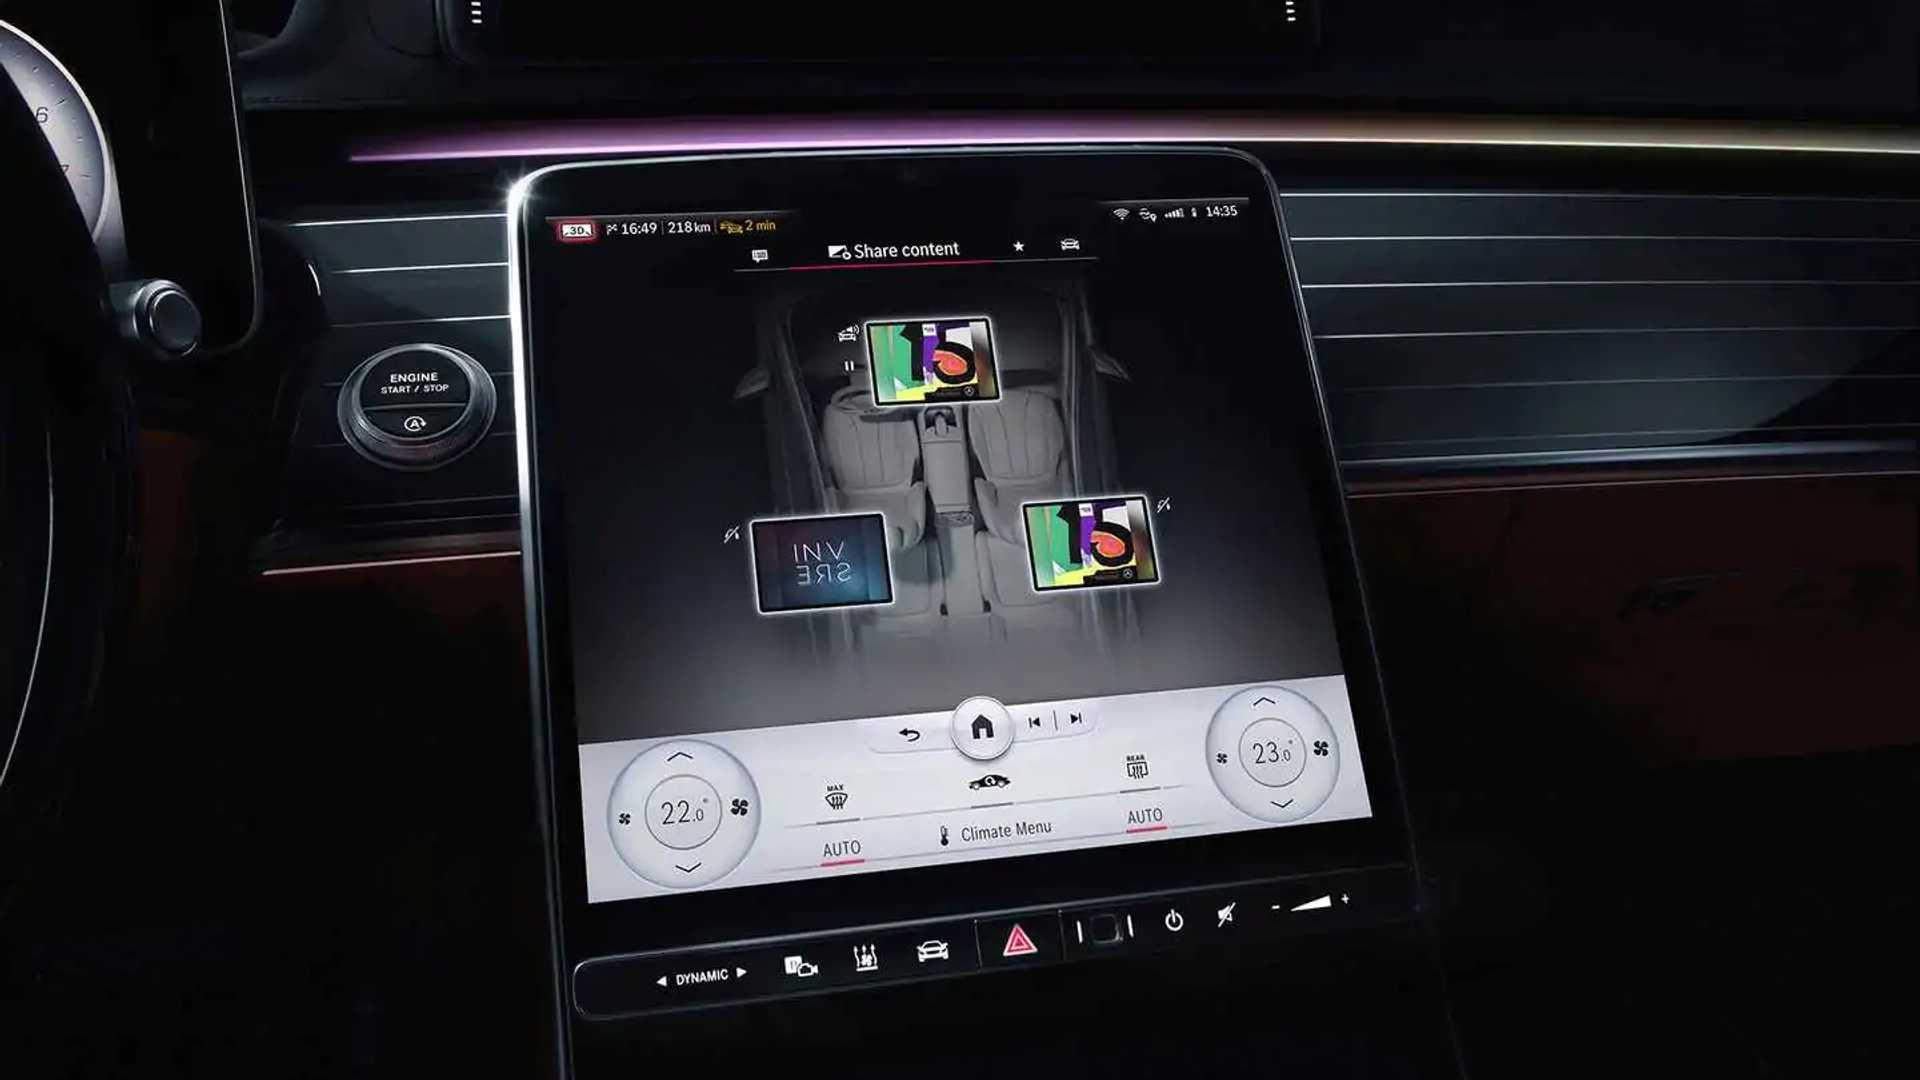 Mercedes-Benz S-Class (2020) My MBUX